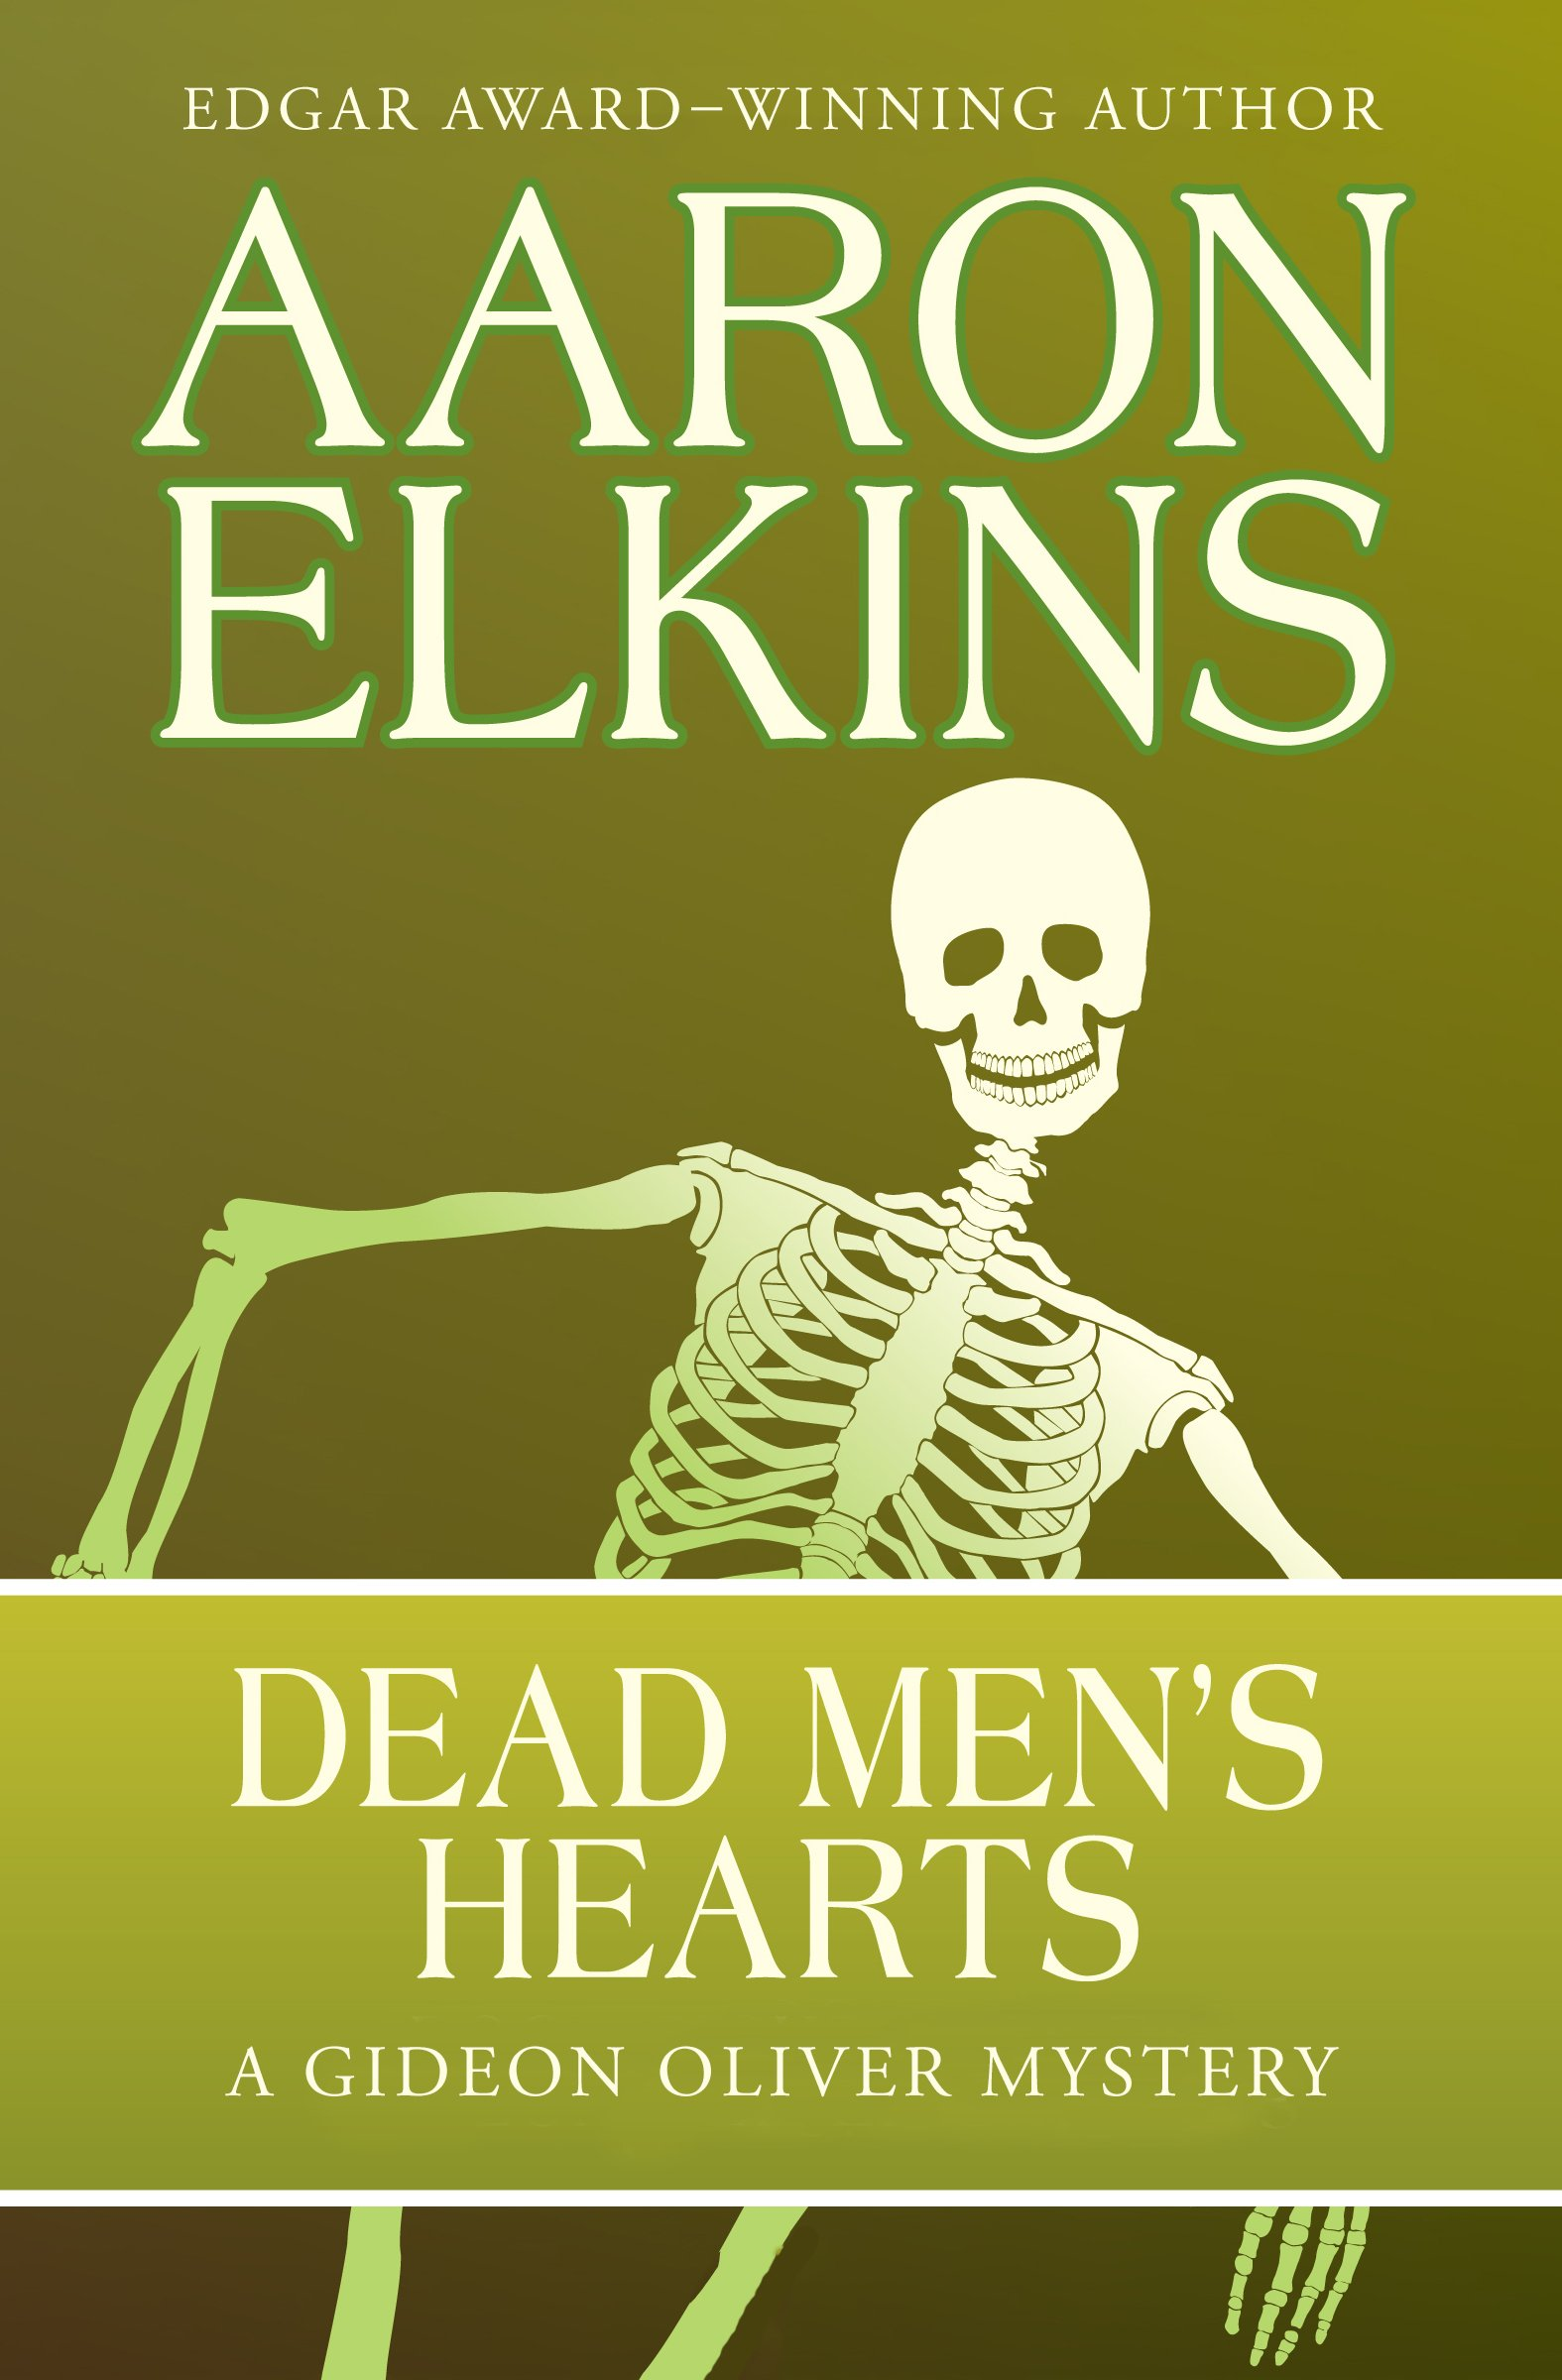 Dead Men's Hearts (The Gideon Oliver Mysteries) (Volume 8) pdf epub